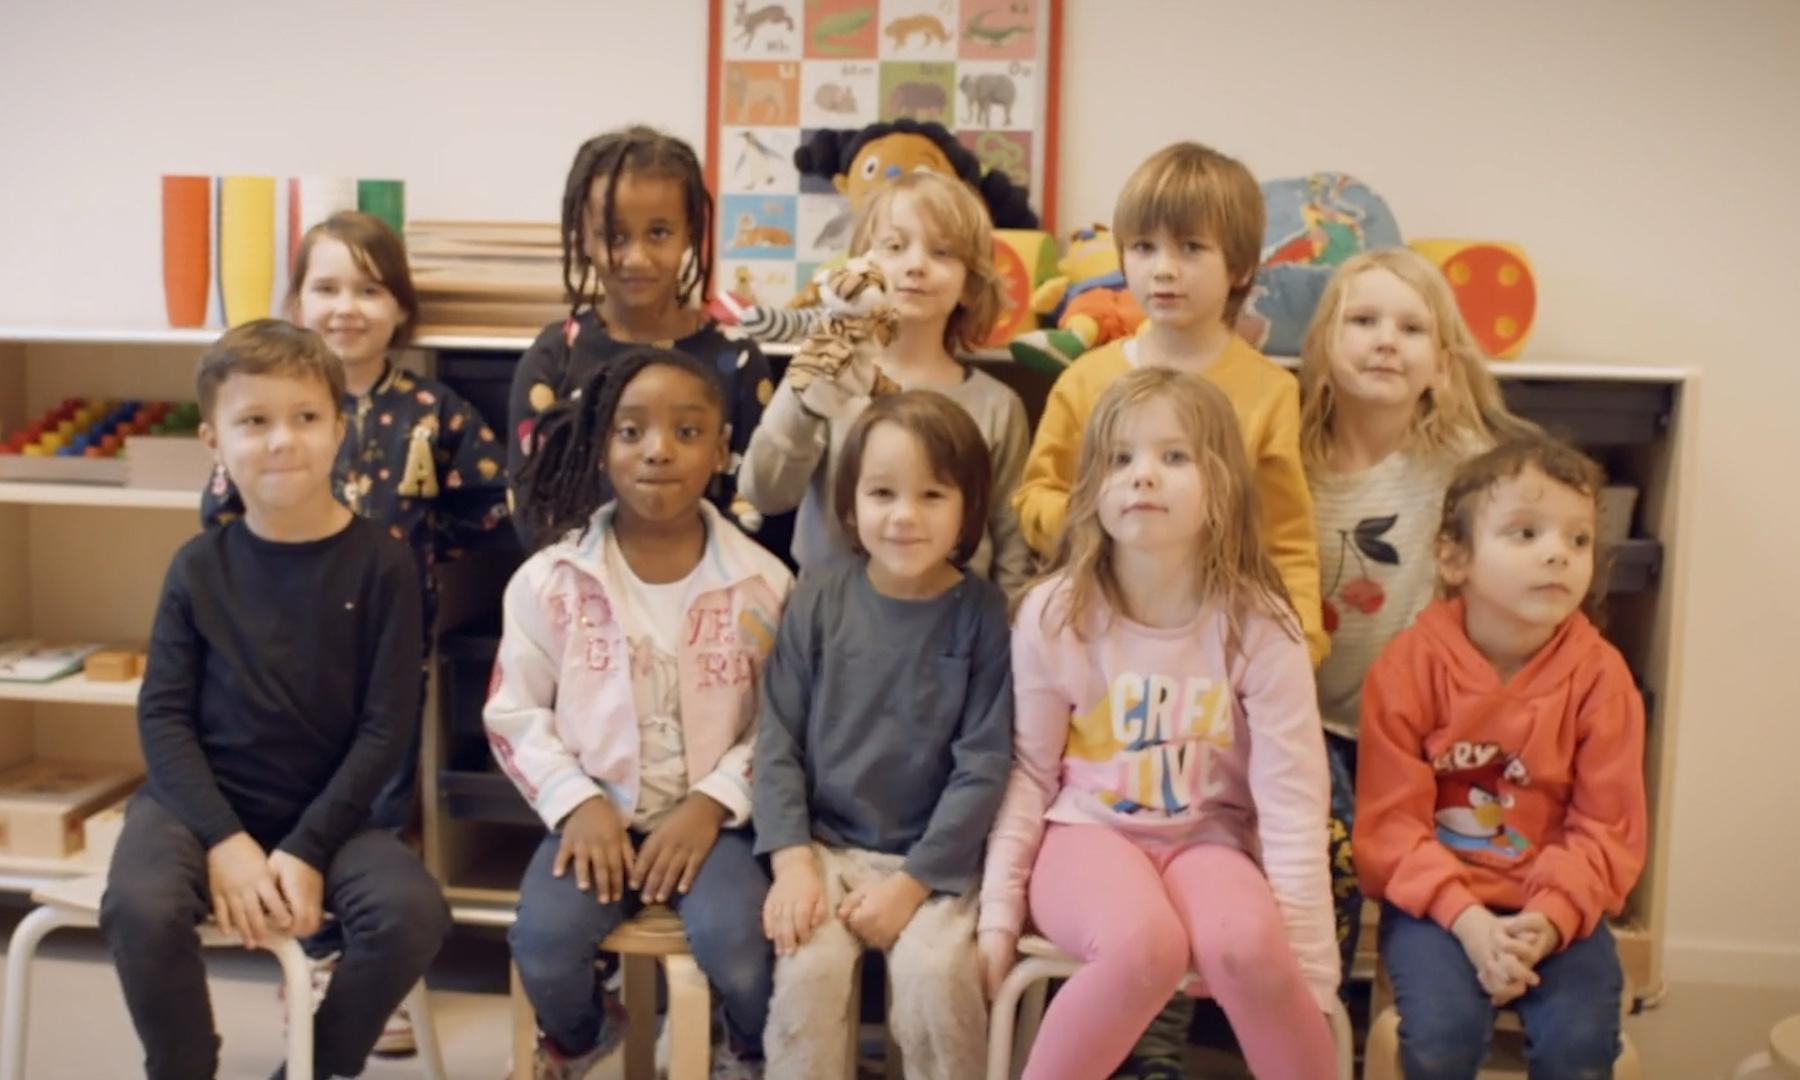 Dutch schoolchildren make video appeal amid teacher shortage